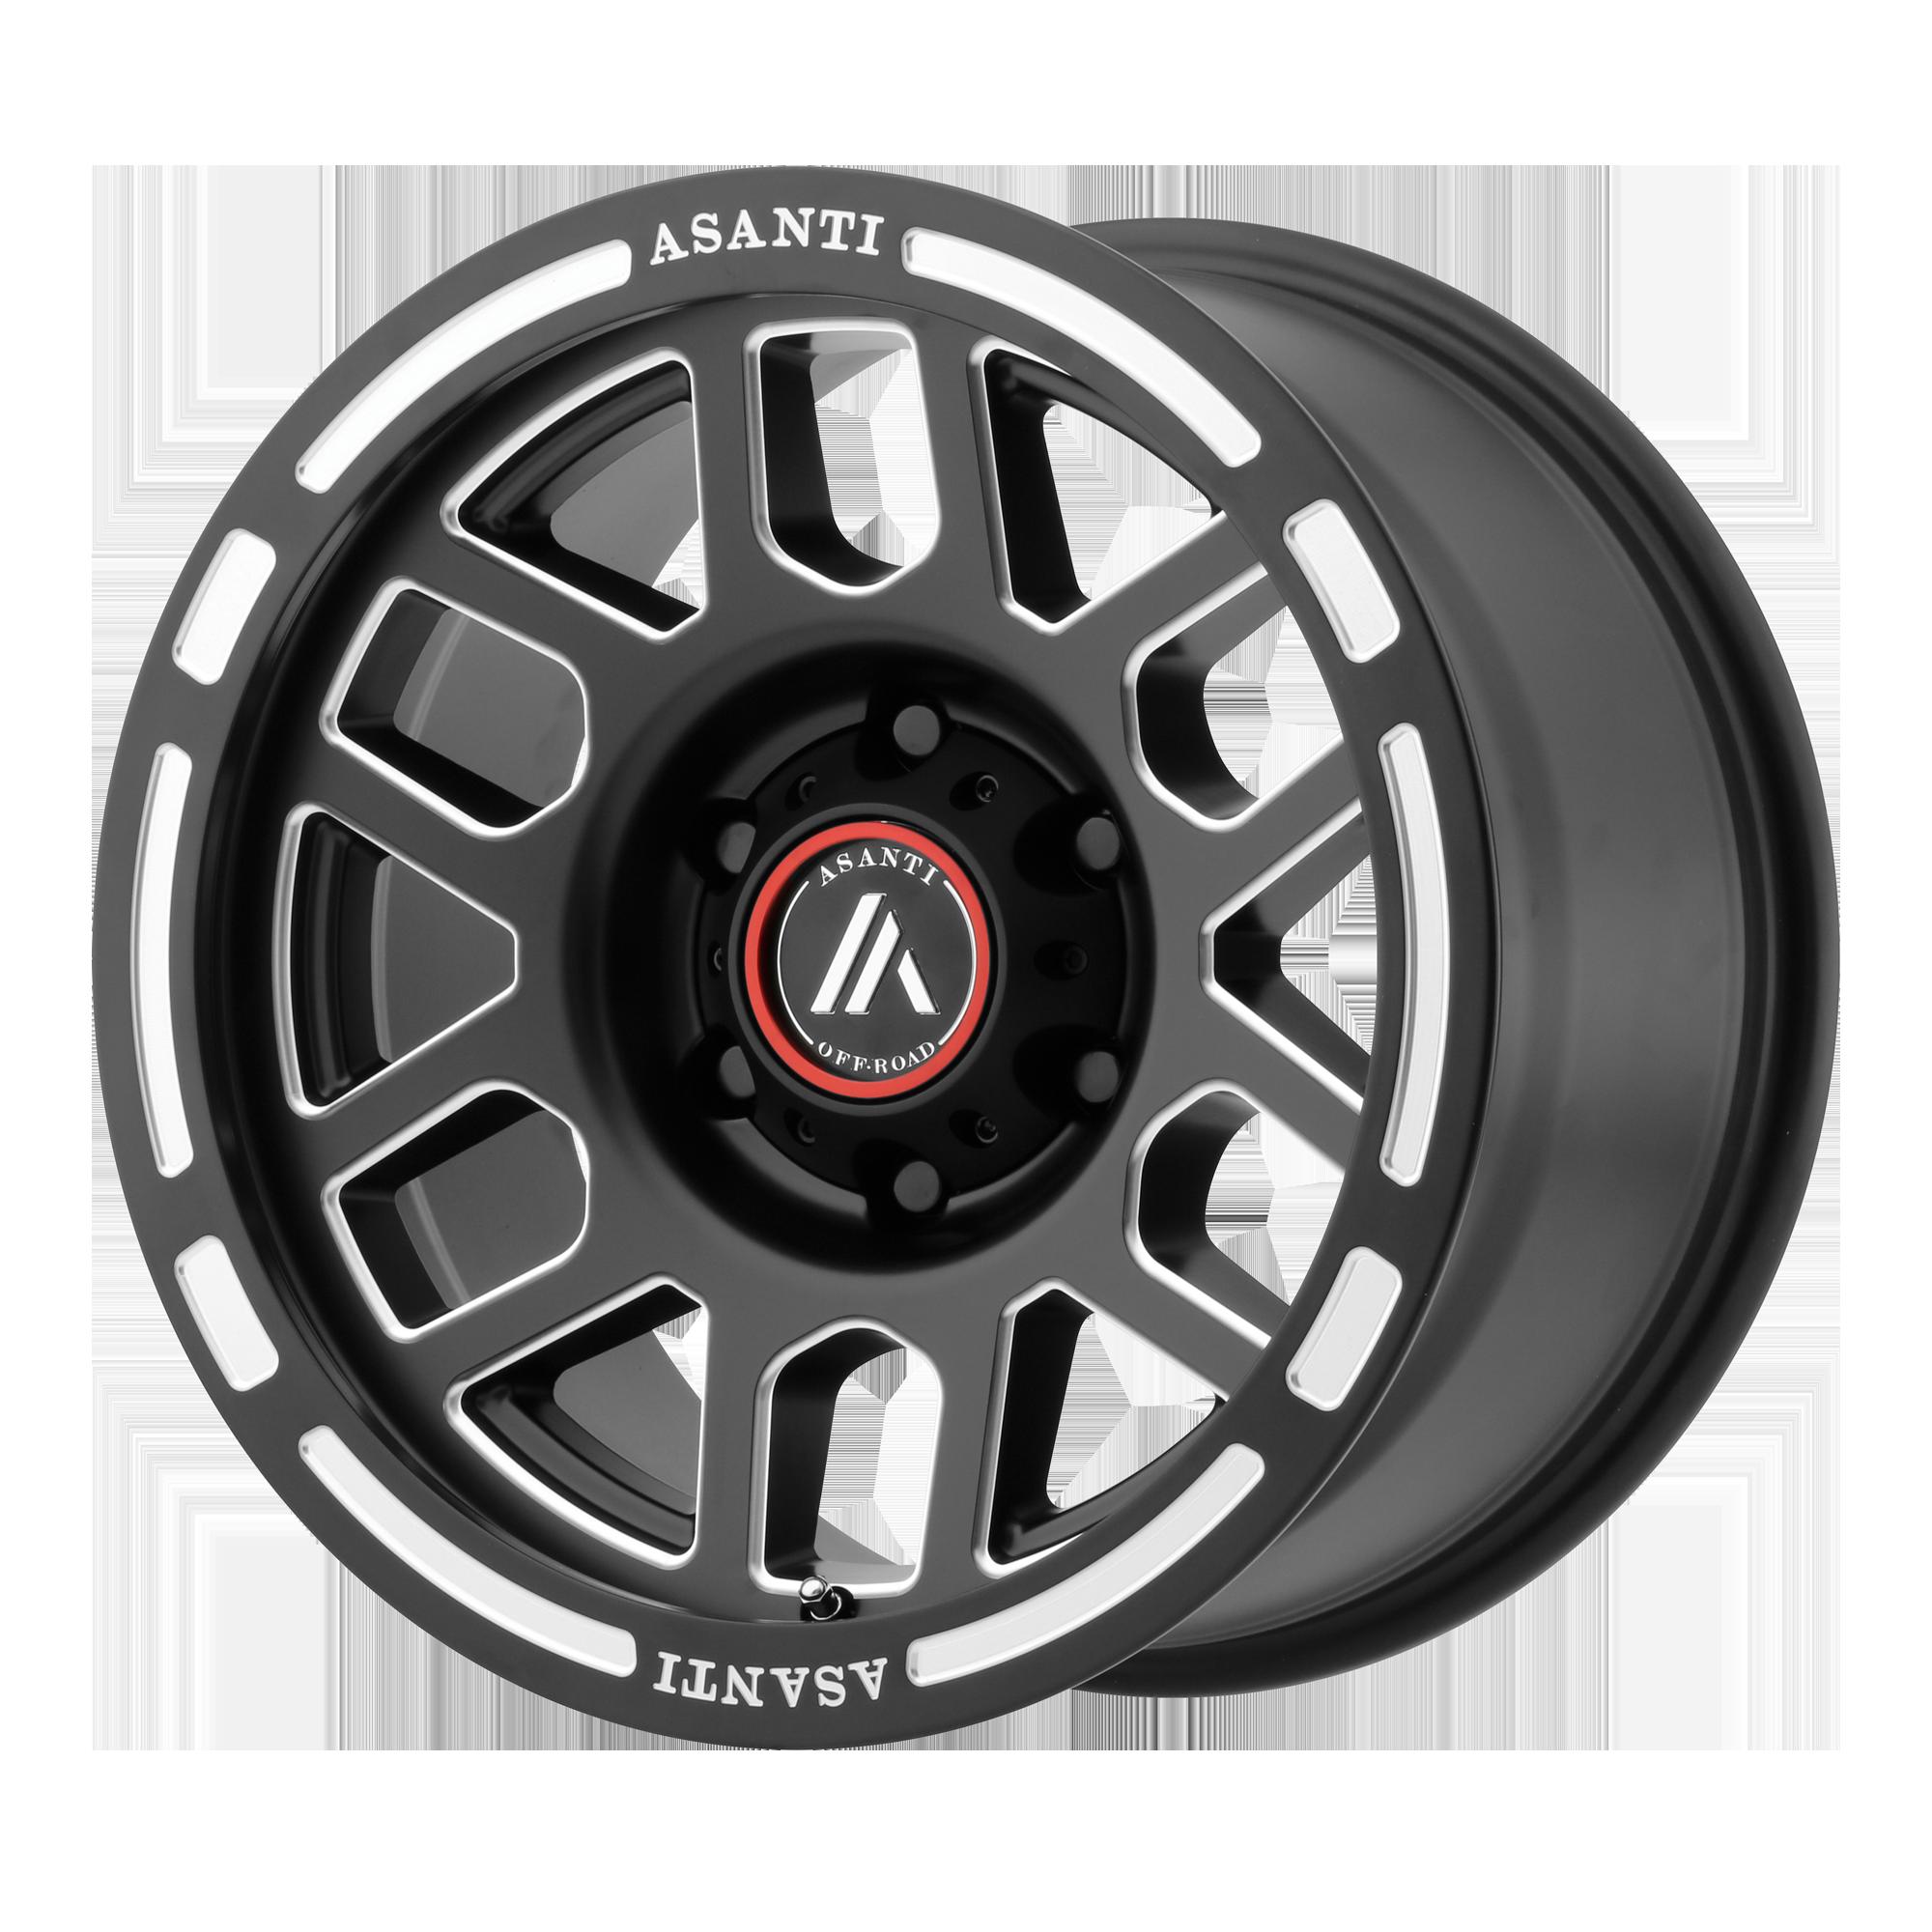 Asanti Off-Road Wheels AB812 Satin Black Milled